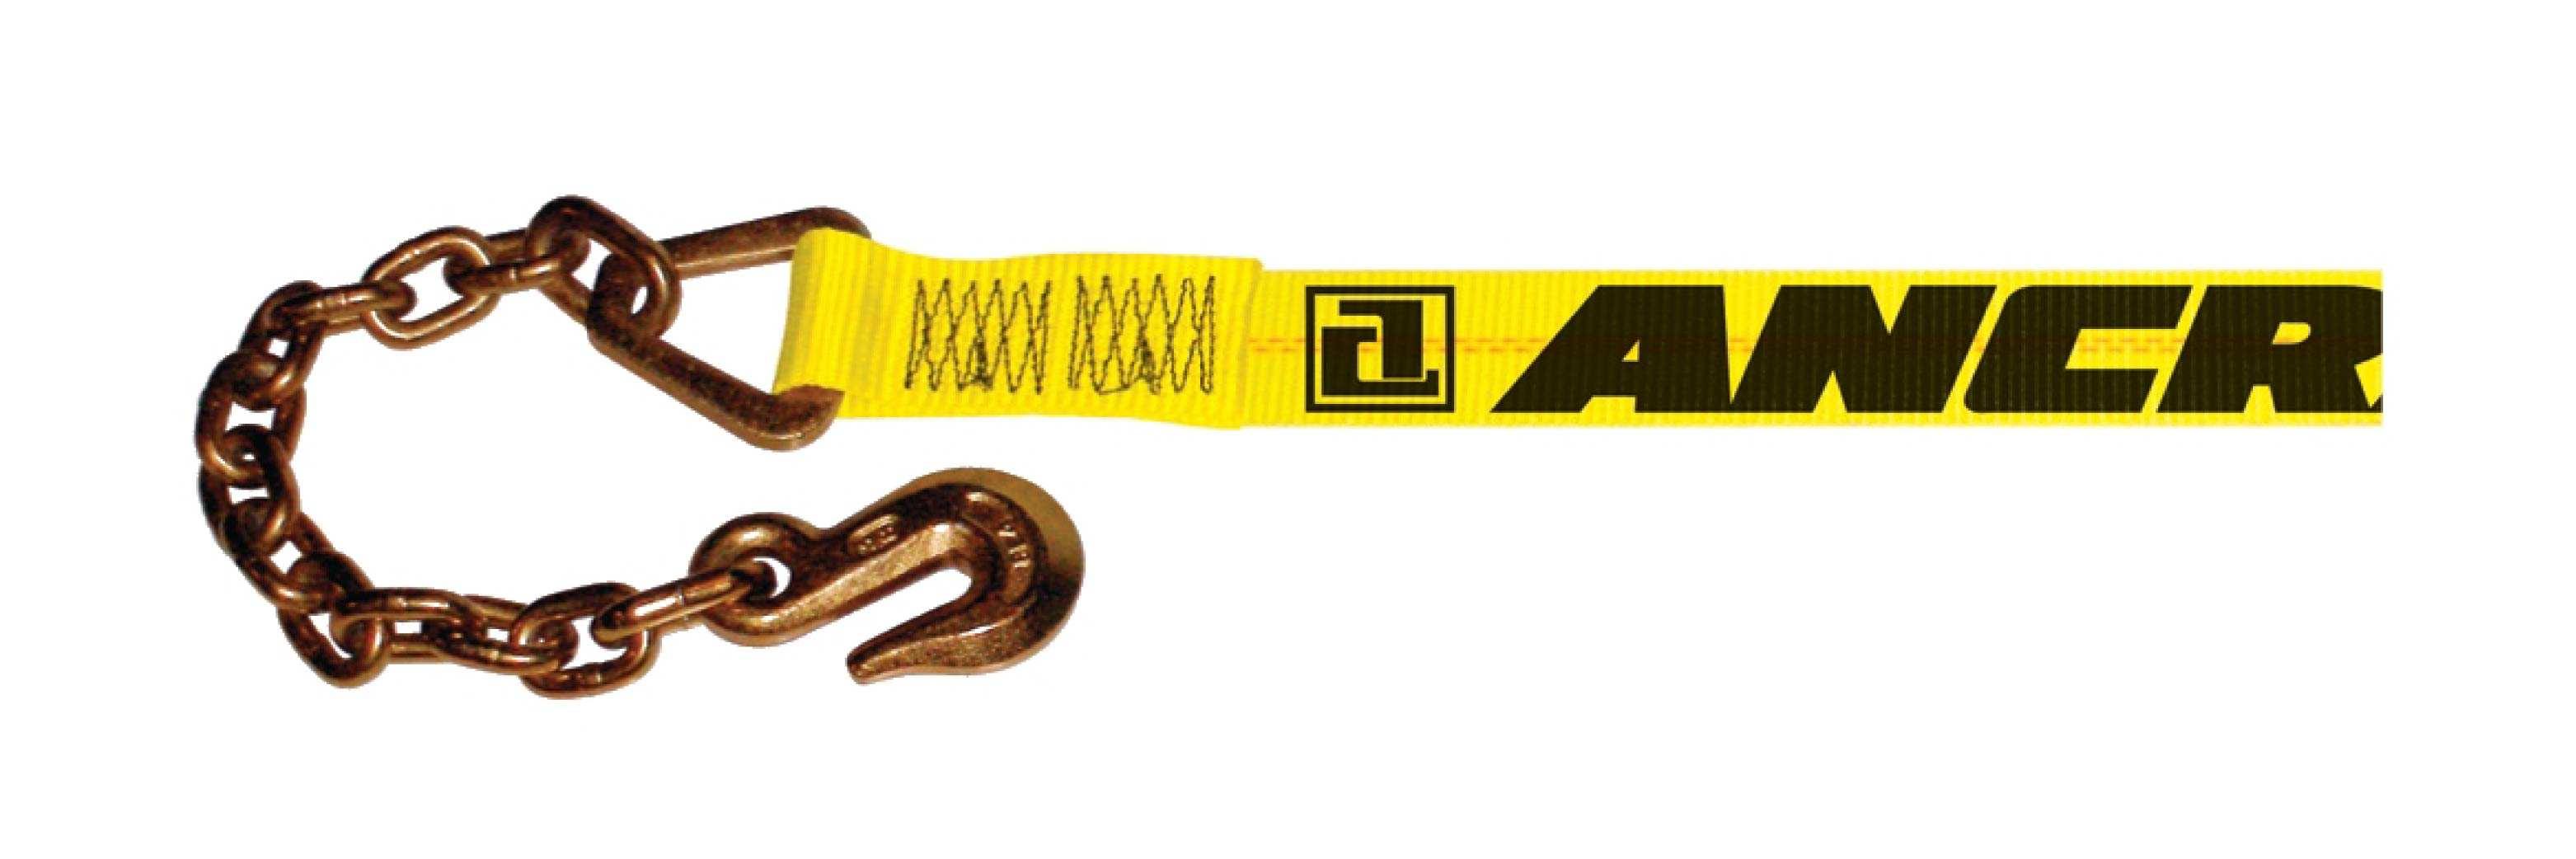 Ancra 2in Winch Strap w/ A-43366-21 Chain Anchor